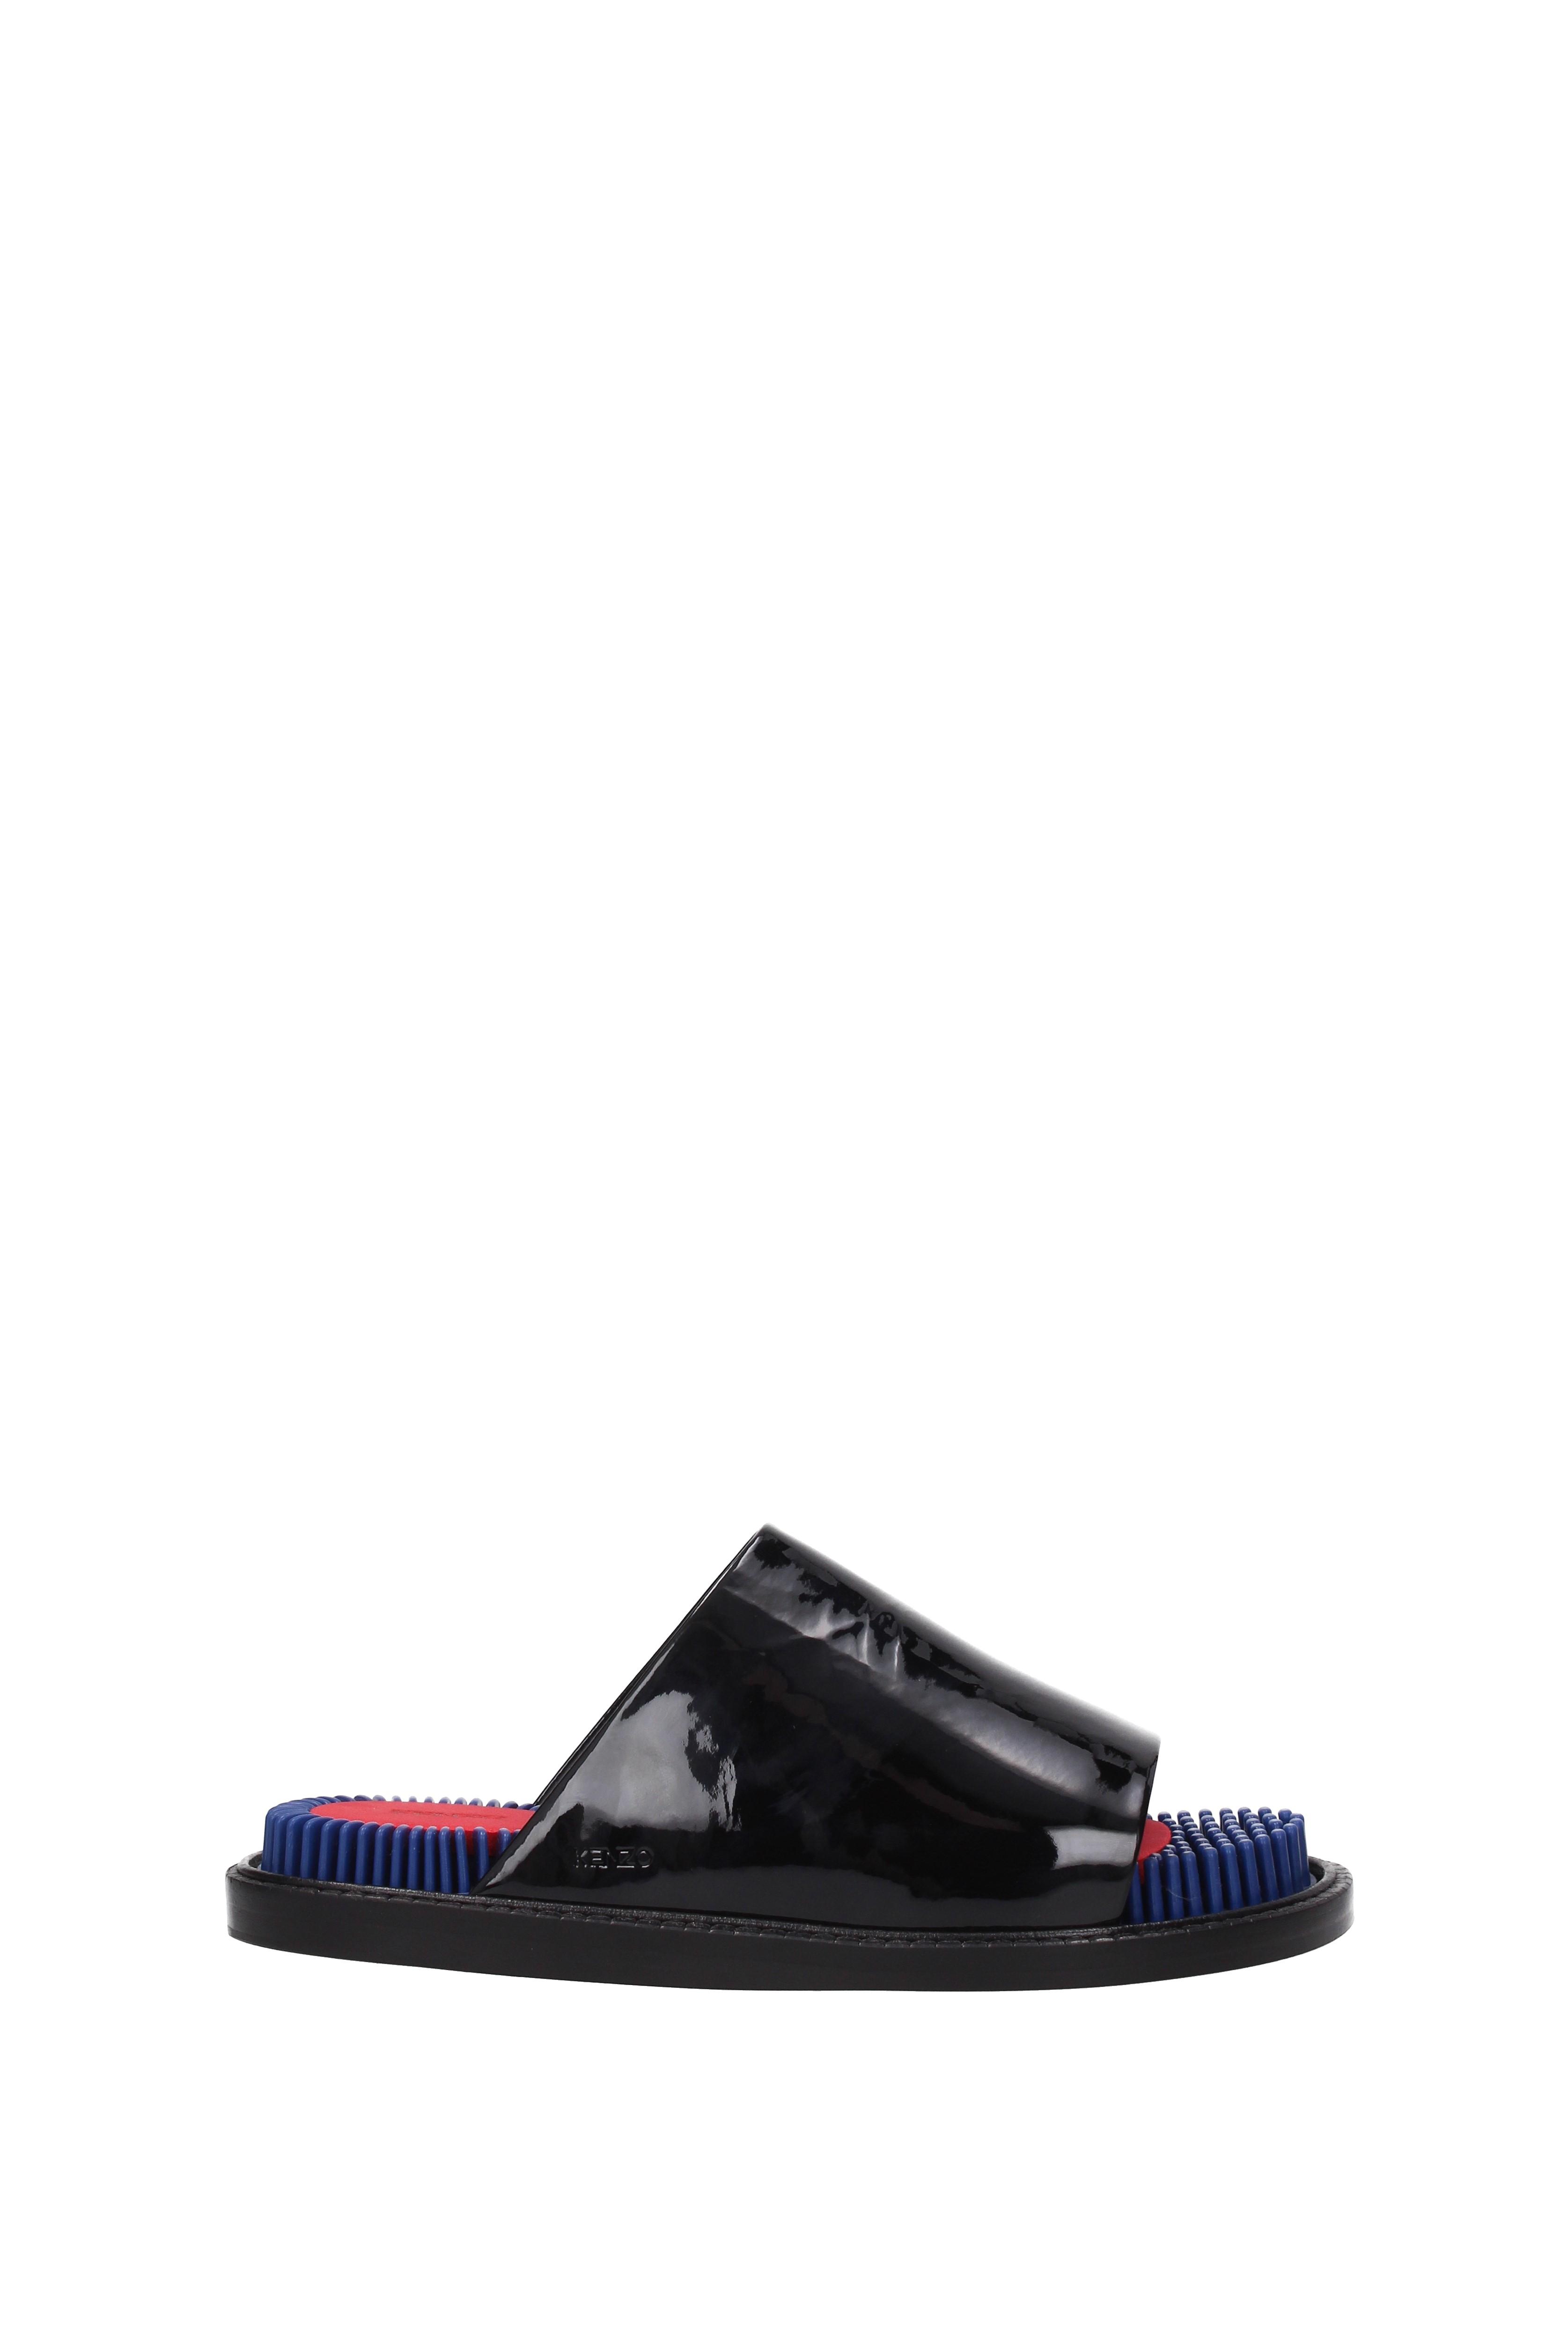 Flip-Flops Kenzo und Holzschuhe Kenzo Flip-Flops Damen - Lackleder (L581SD292K61) 7c861d